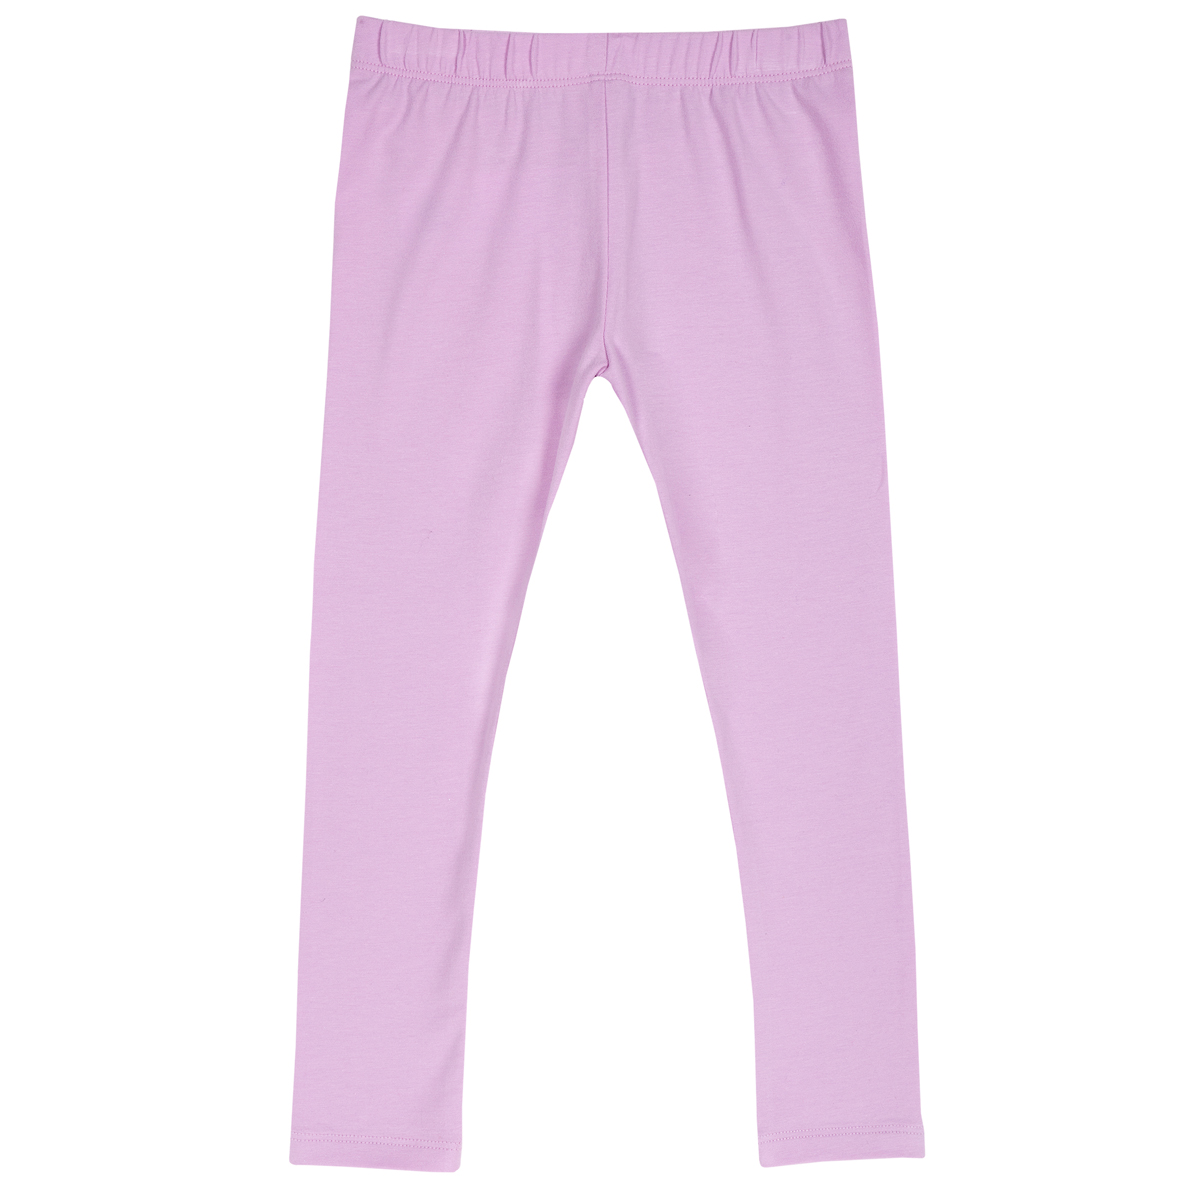 Pantalon lung copii Chicco, lila, 25818 din categoria Pantaloni copii